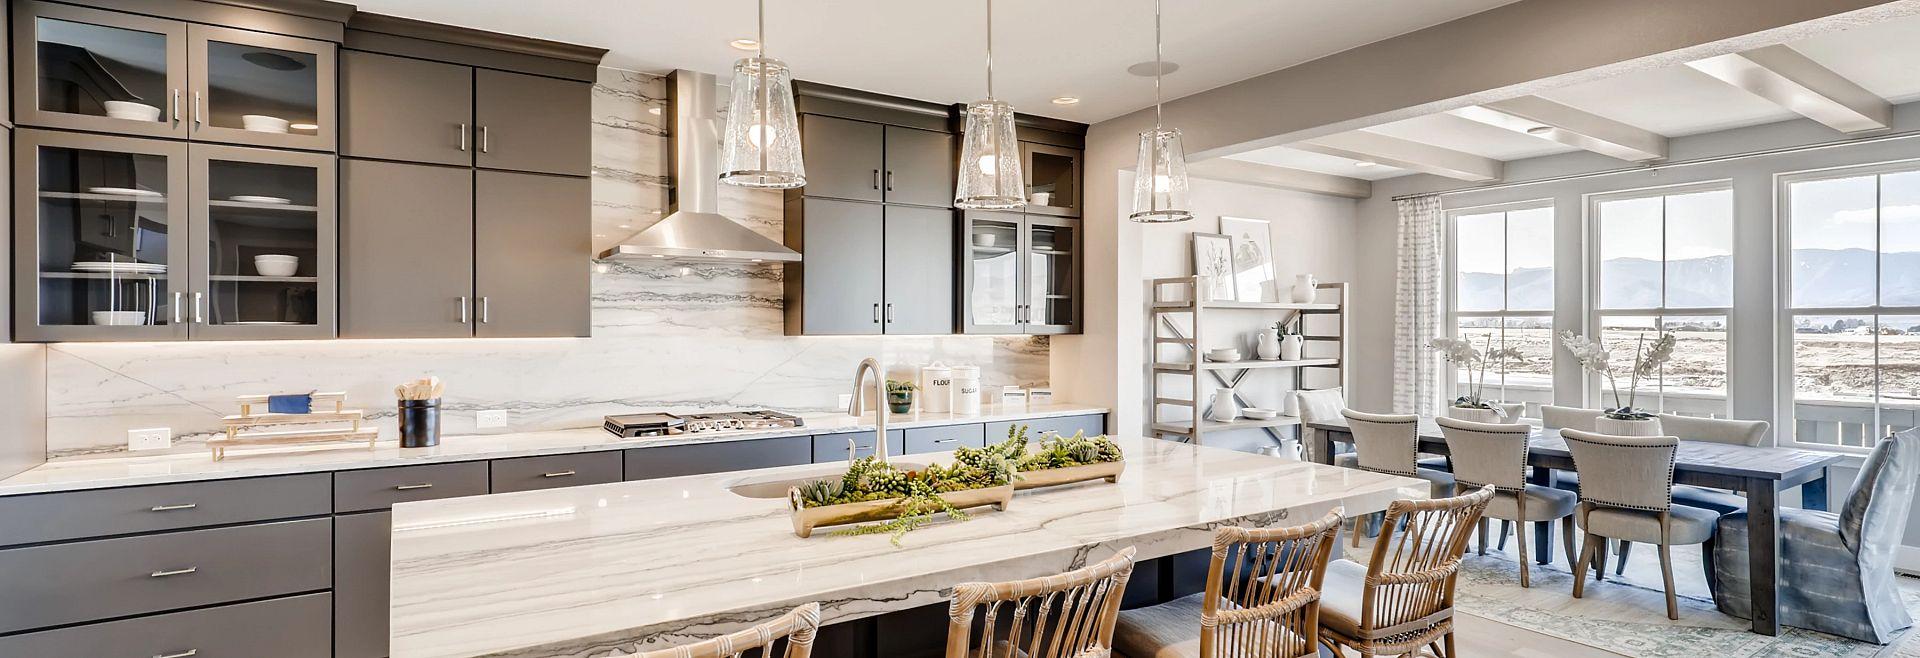 Solstice Trails Edge Tallgrass Kitchen & Dining